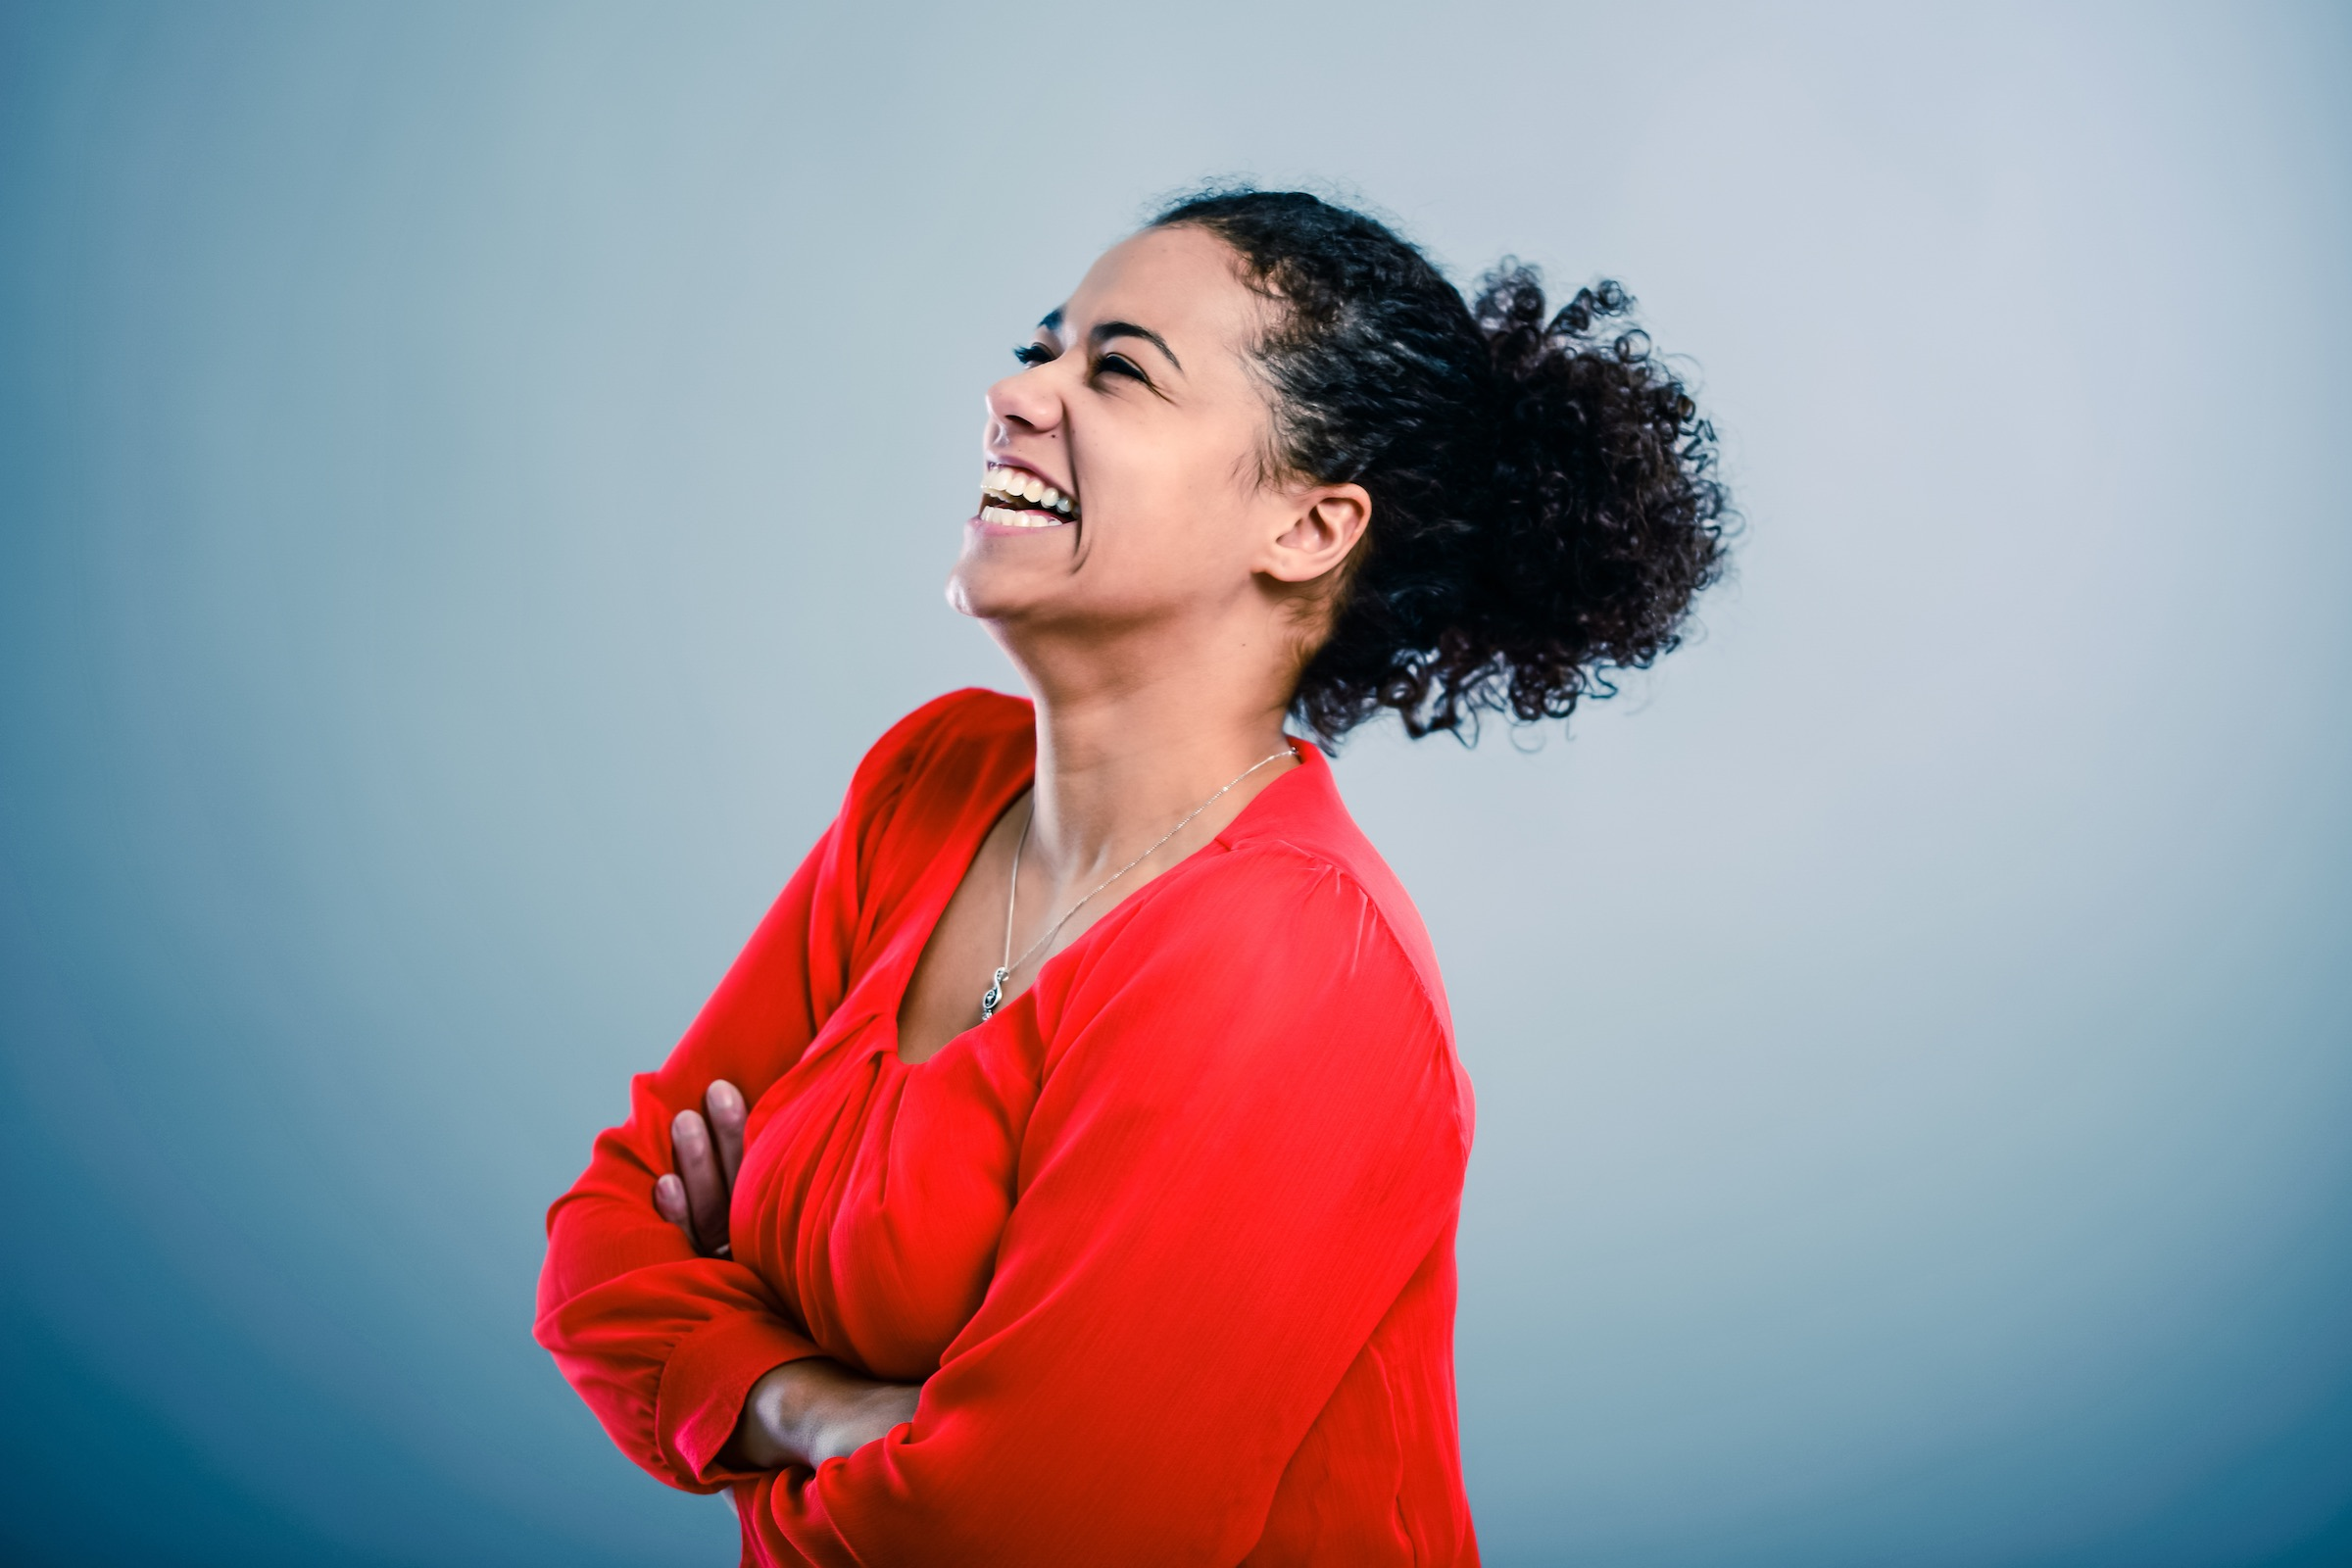 hochzeitssängerin | Hannover | Sängerin | Kirchensängerin | Hochzeit | Sängerin | Lieder | Trauung | Sängerin | Trauung | Sängerin | Kirche | Preise | Buchen | Mieten | Nathalie | Chérestal | Lehmann | Eventservice